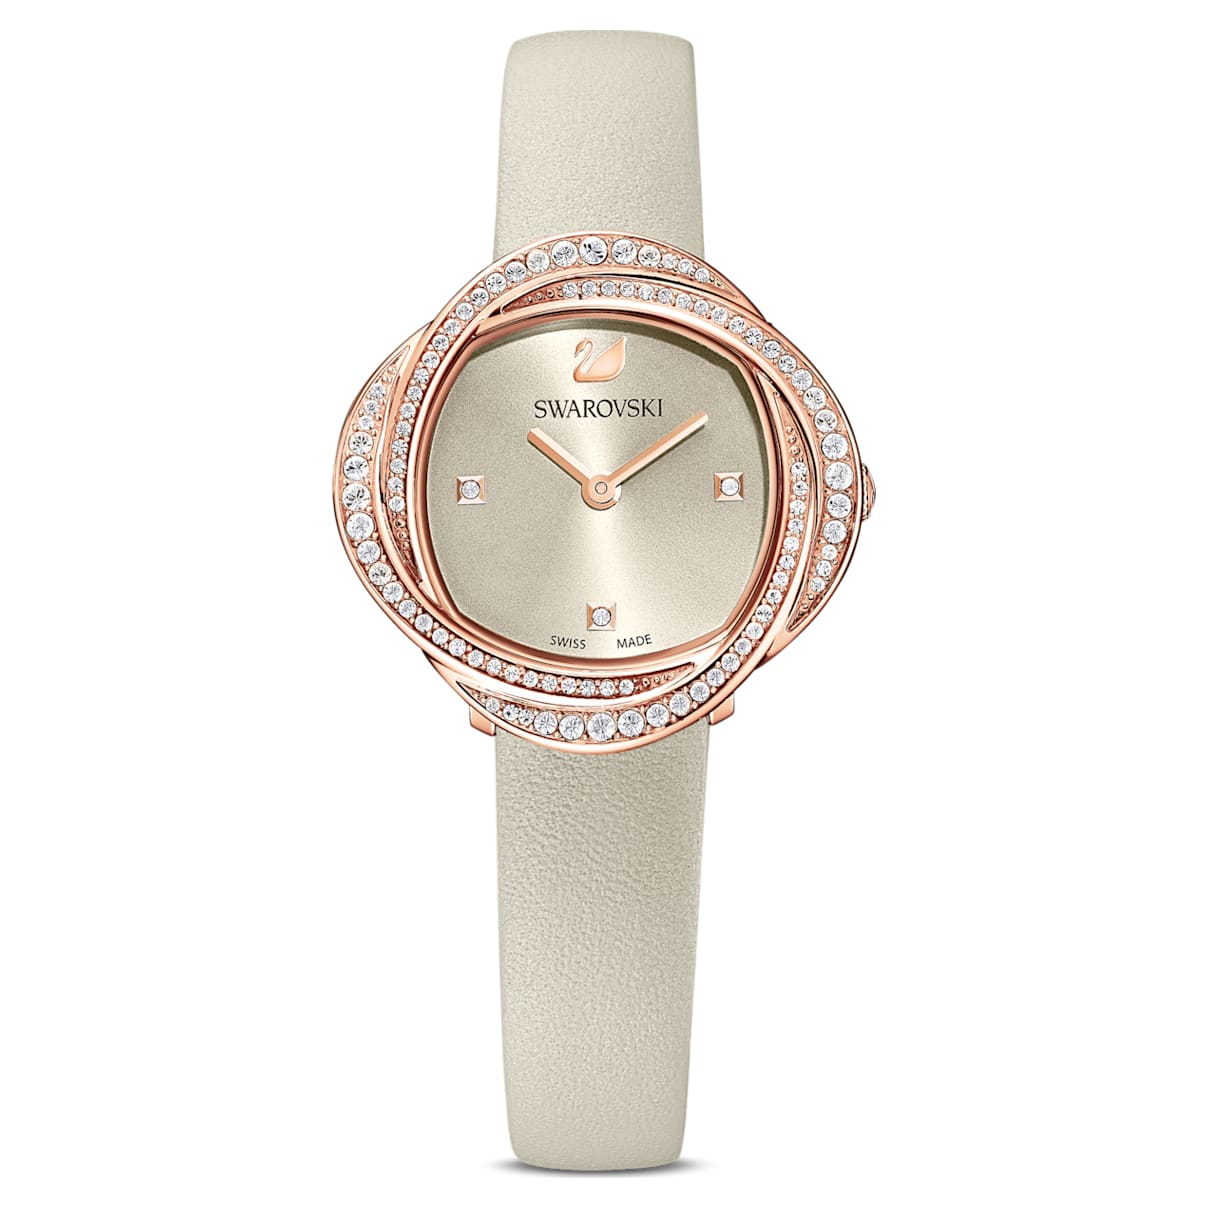 Orologio Crystal Flower, cinturino in pelle, grigio, PVD oro rosa